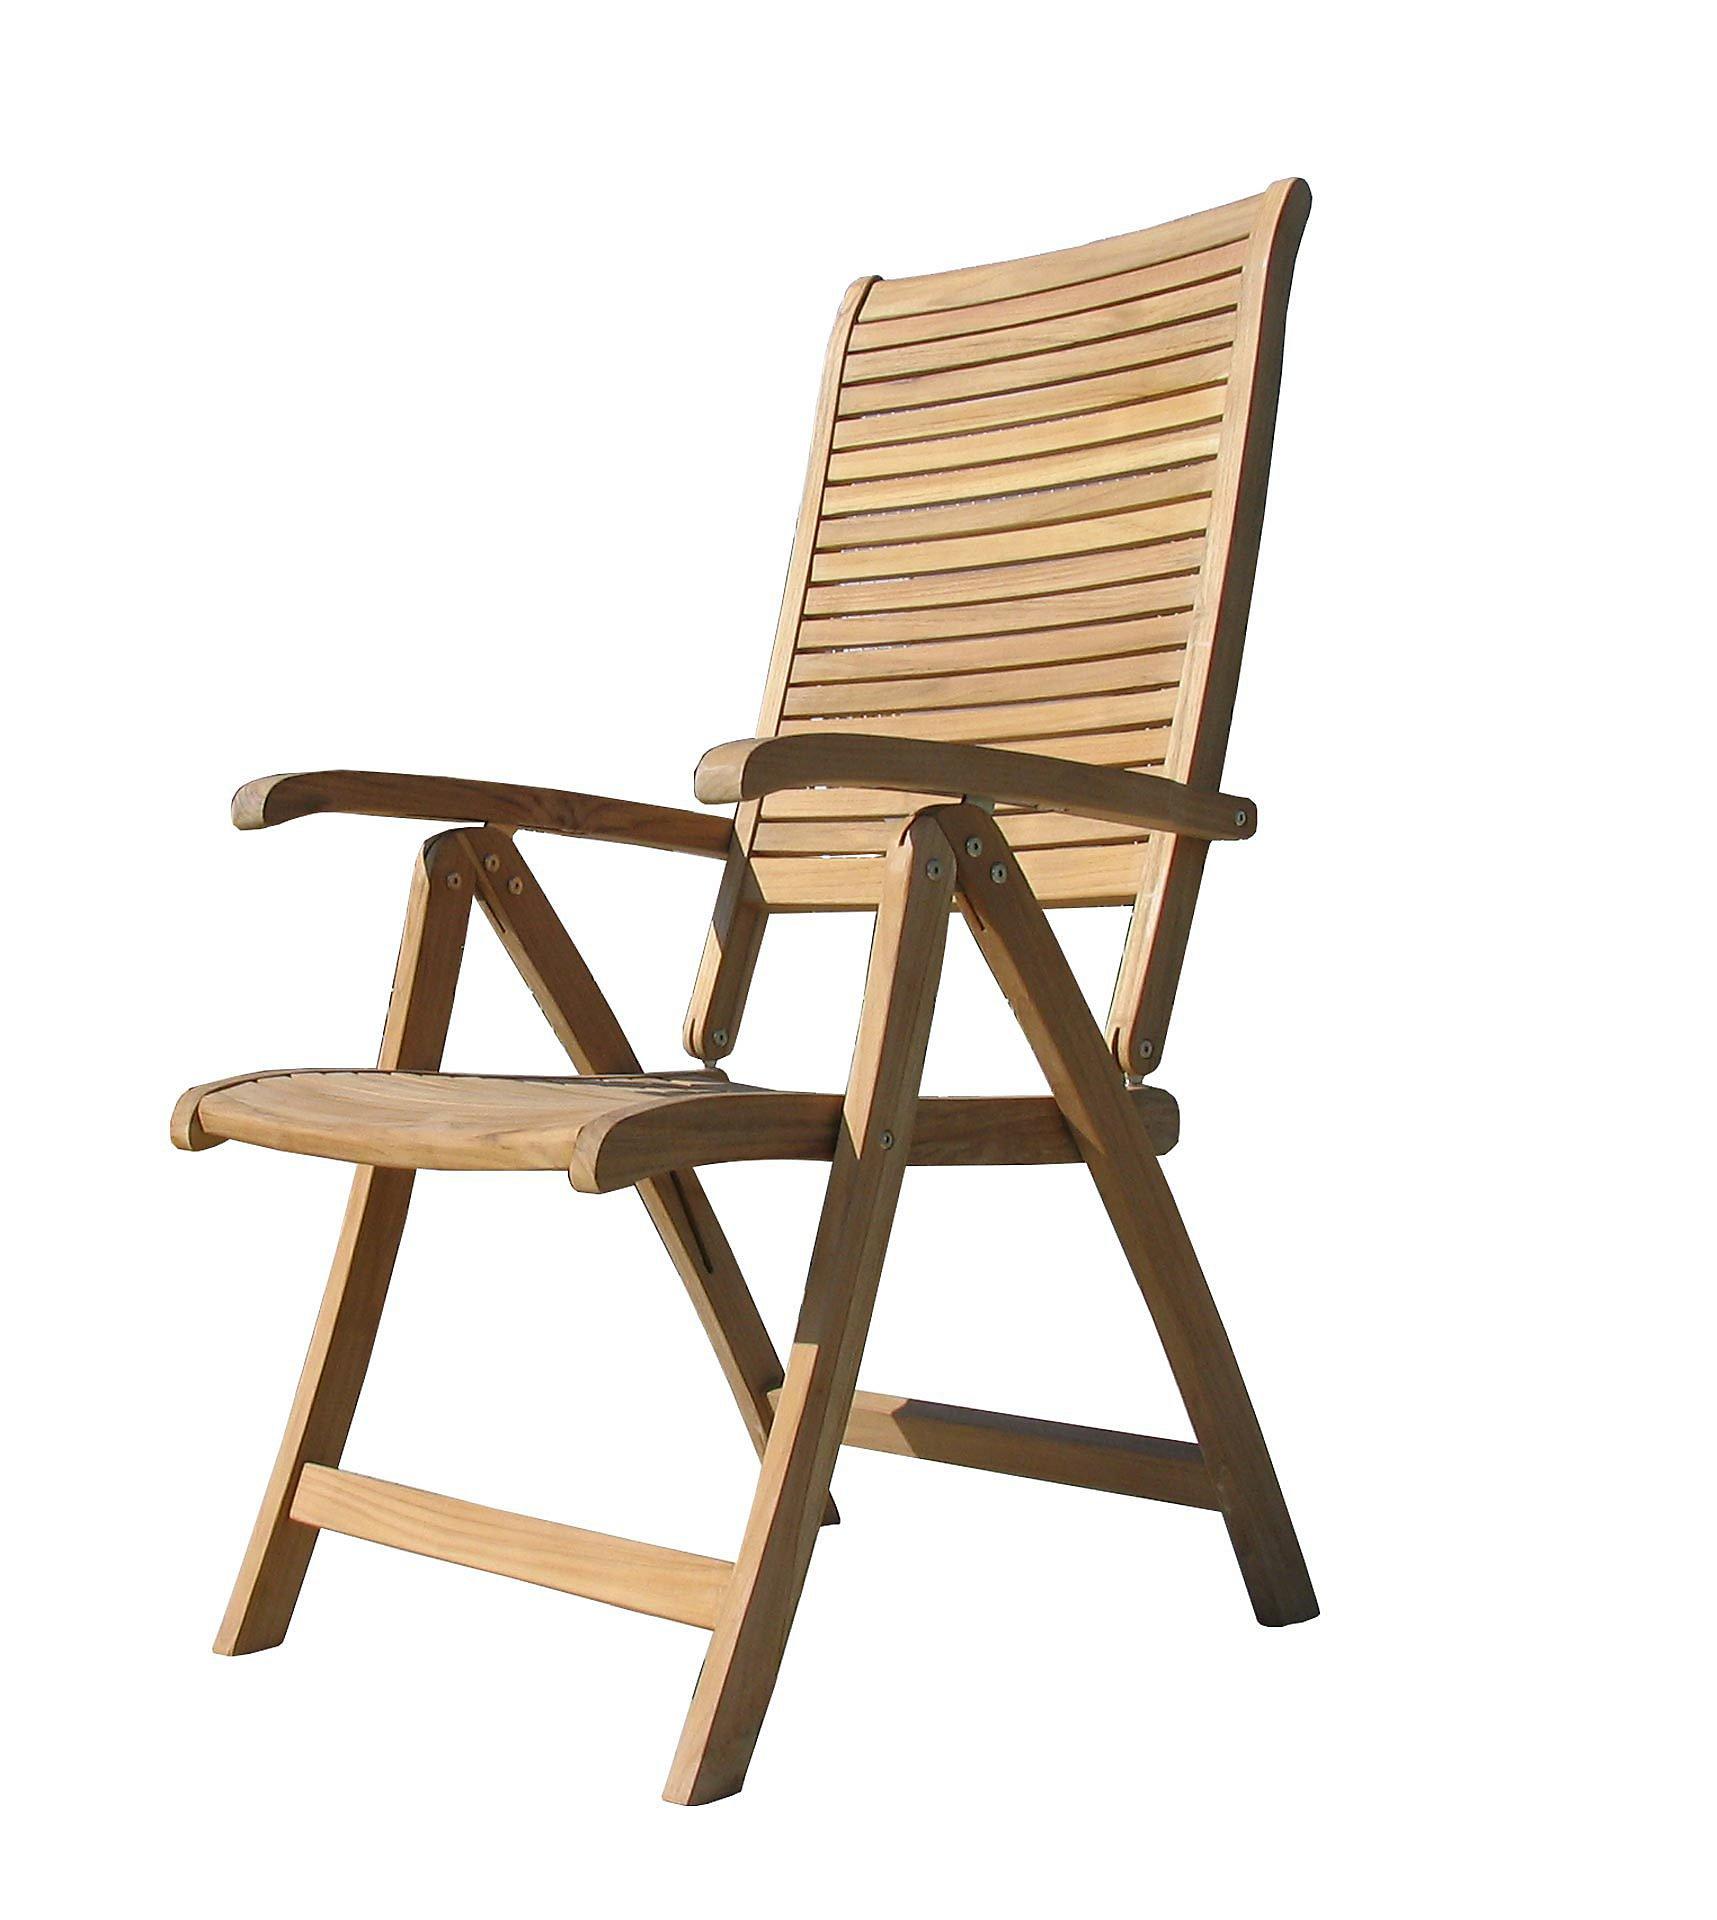 Grasekamp Teak Sessel Verstellbar Gartenstuhle Klappstuhl Teak Holz